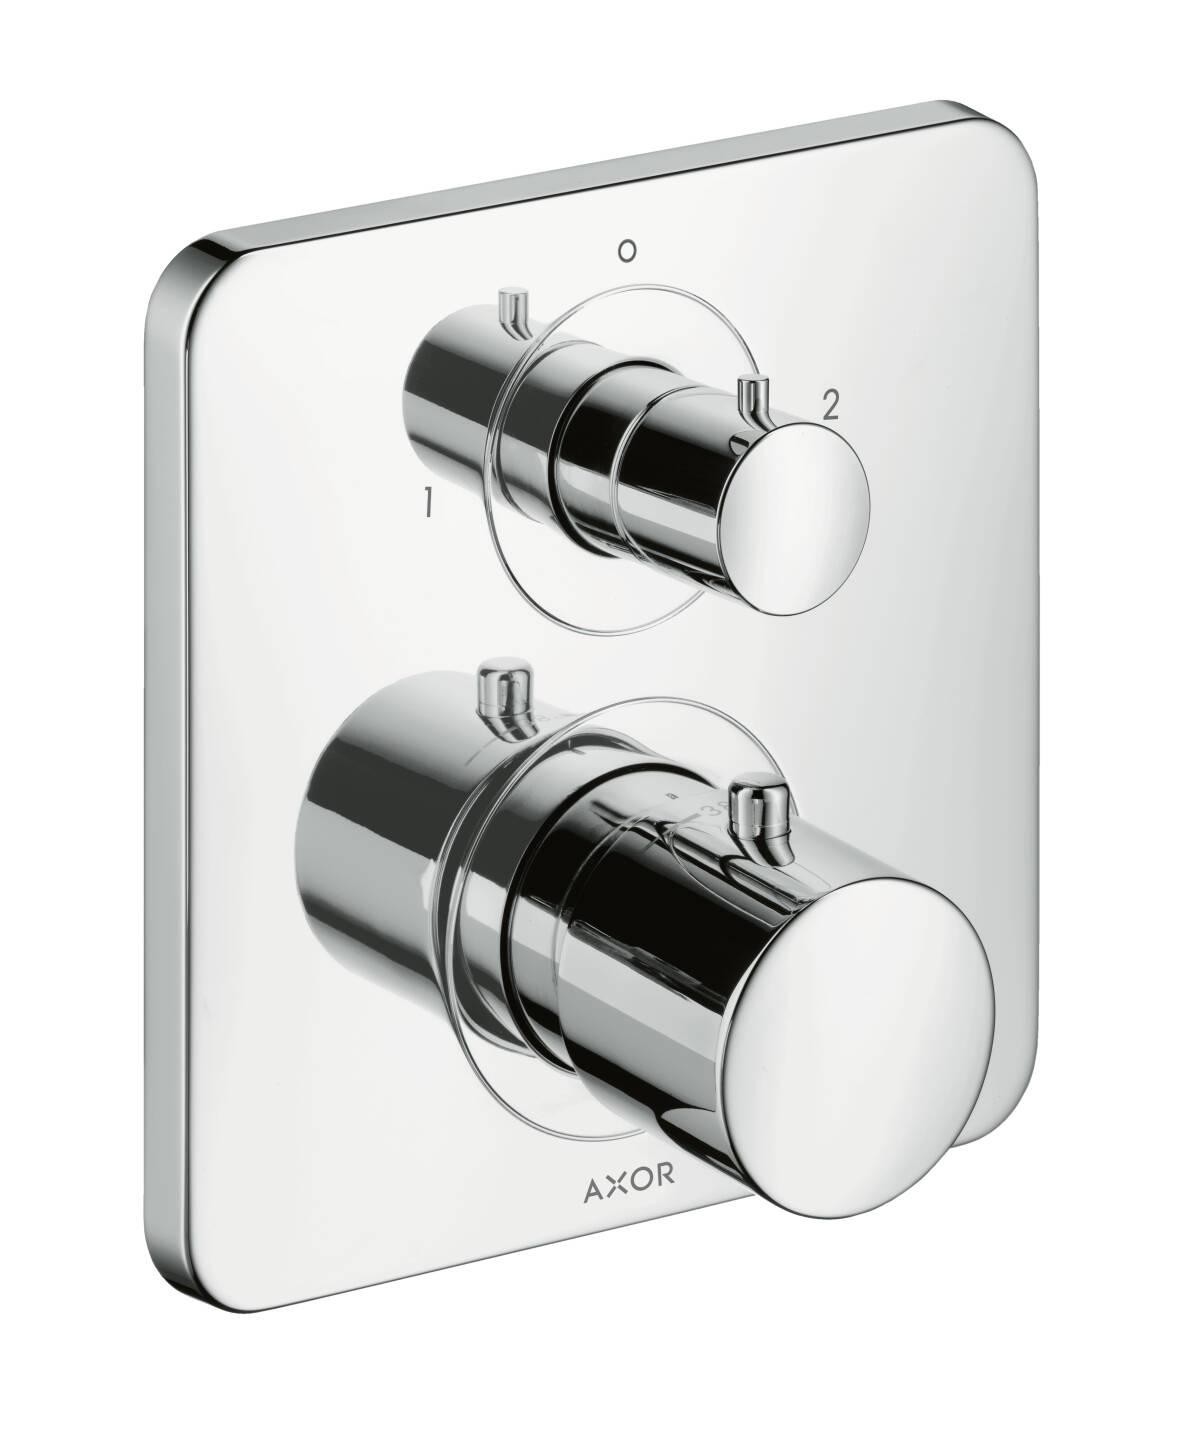 Thermostat for concealed installation with shut-off/ diverter valve, Brushed Black Chrome, 34725340